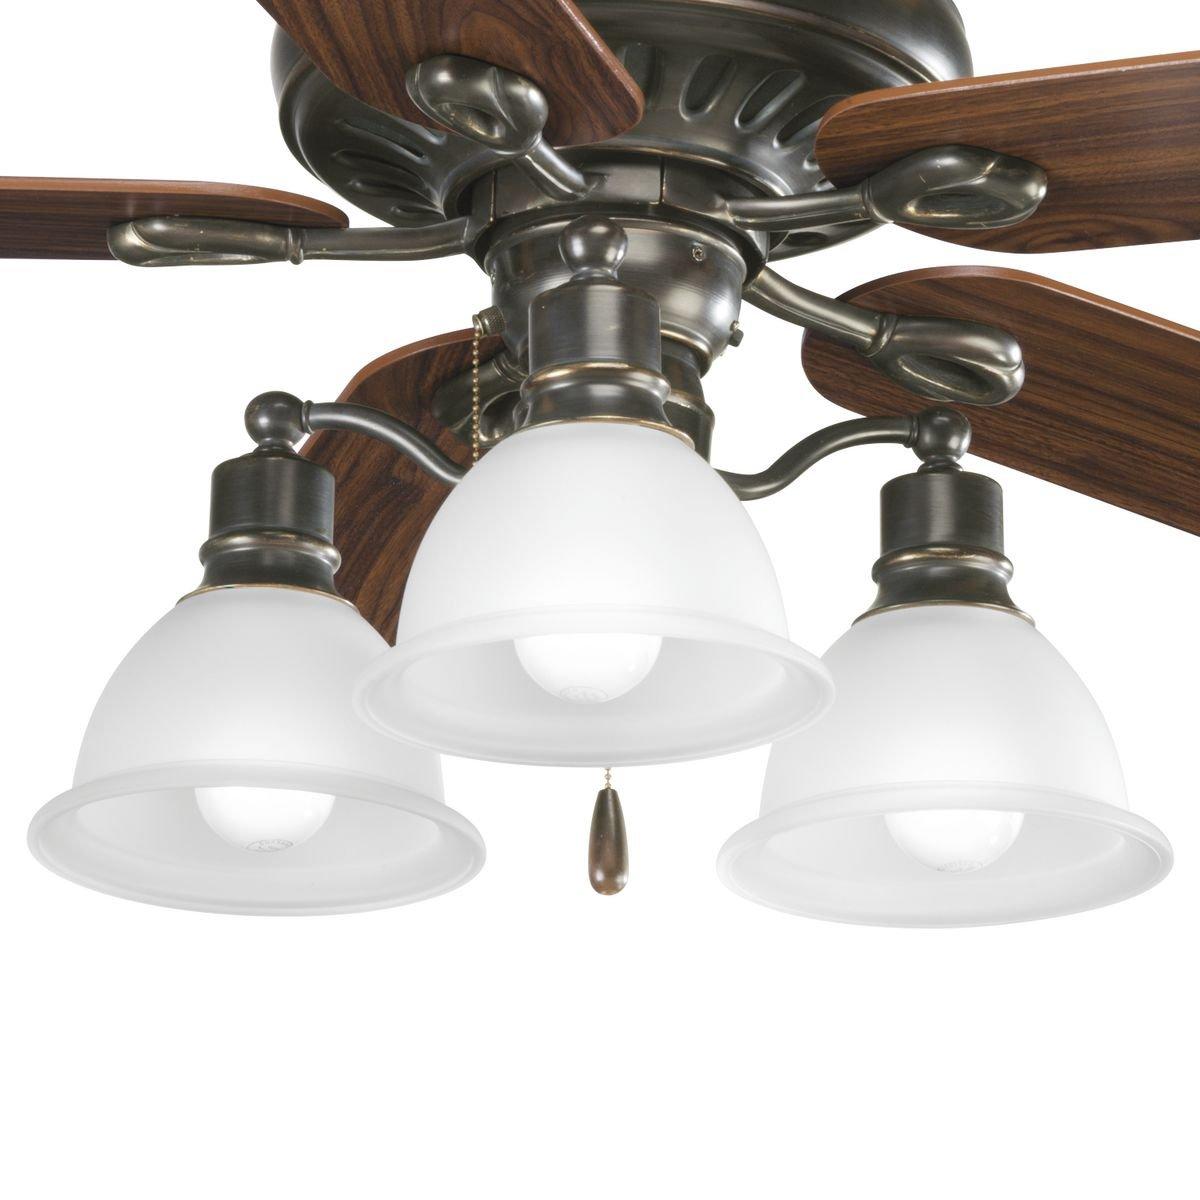 Progress Lighting P2623-09 3-Light Fan Light Kit Brushed Nickel